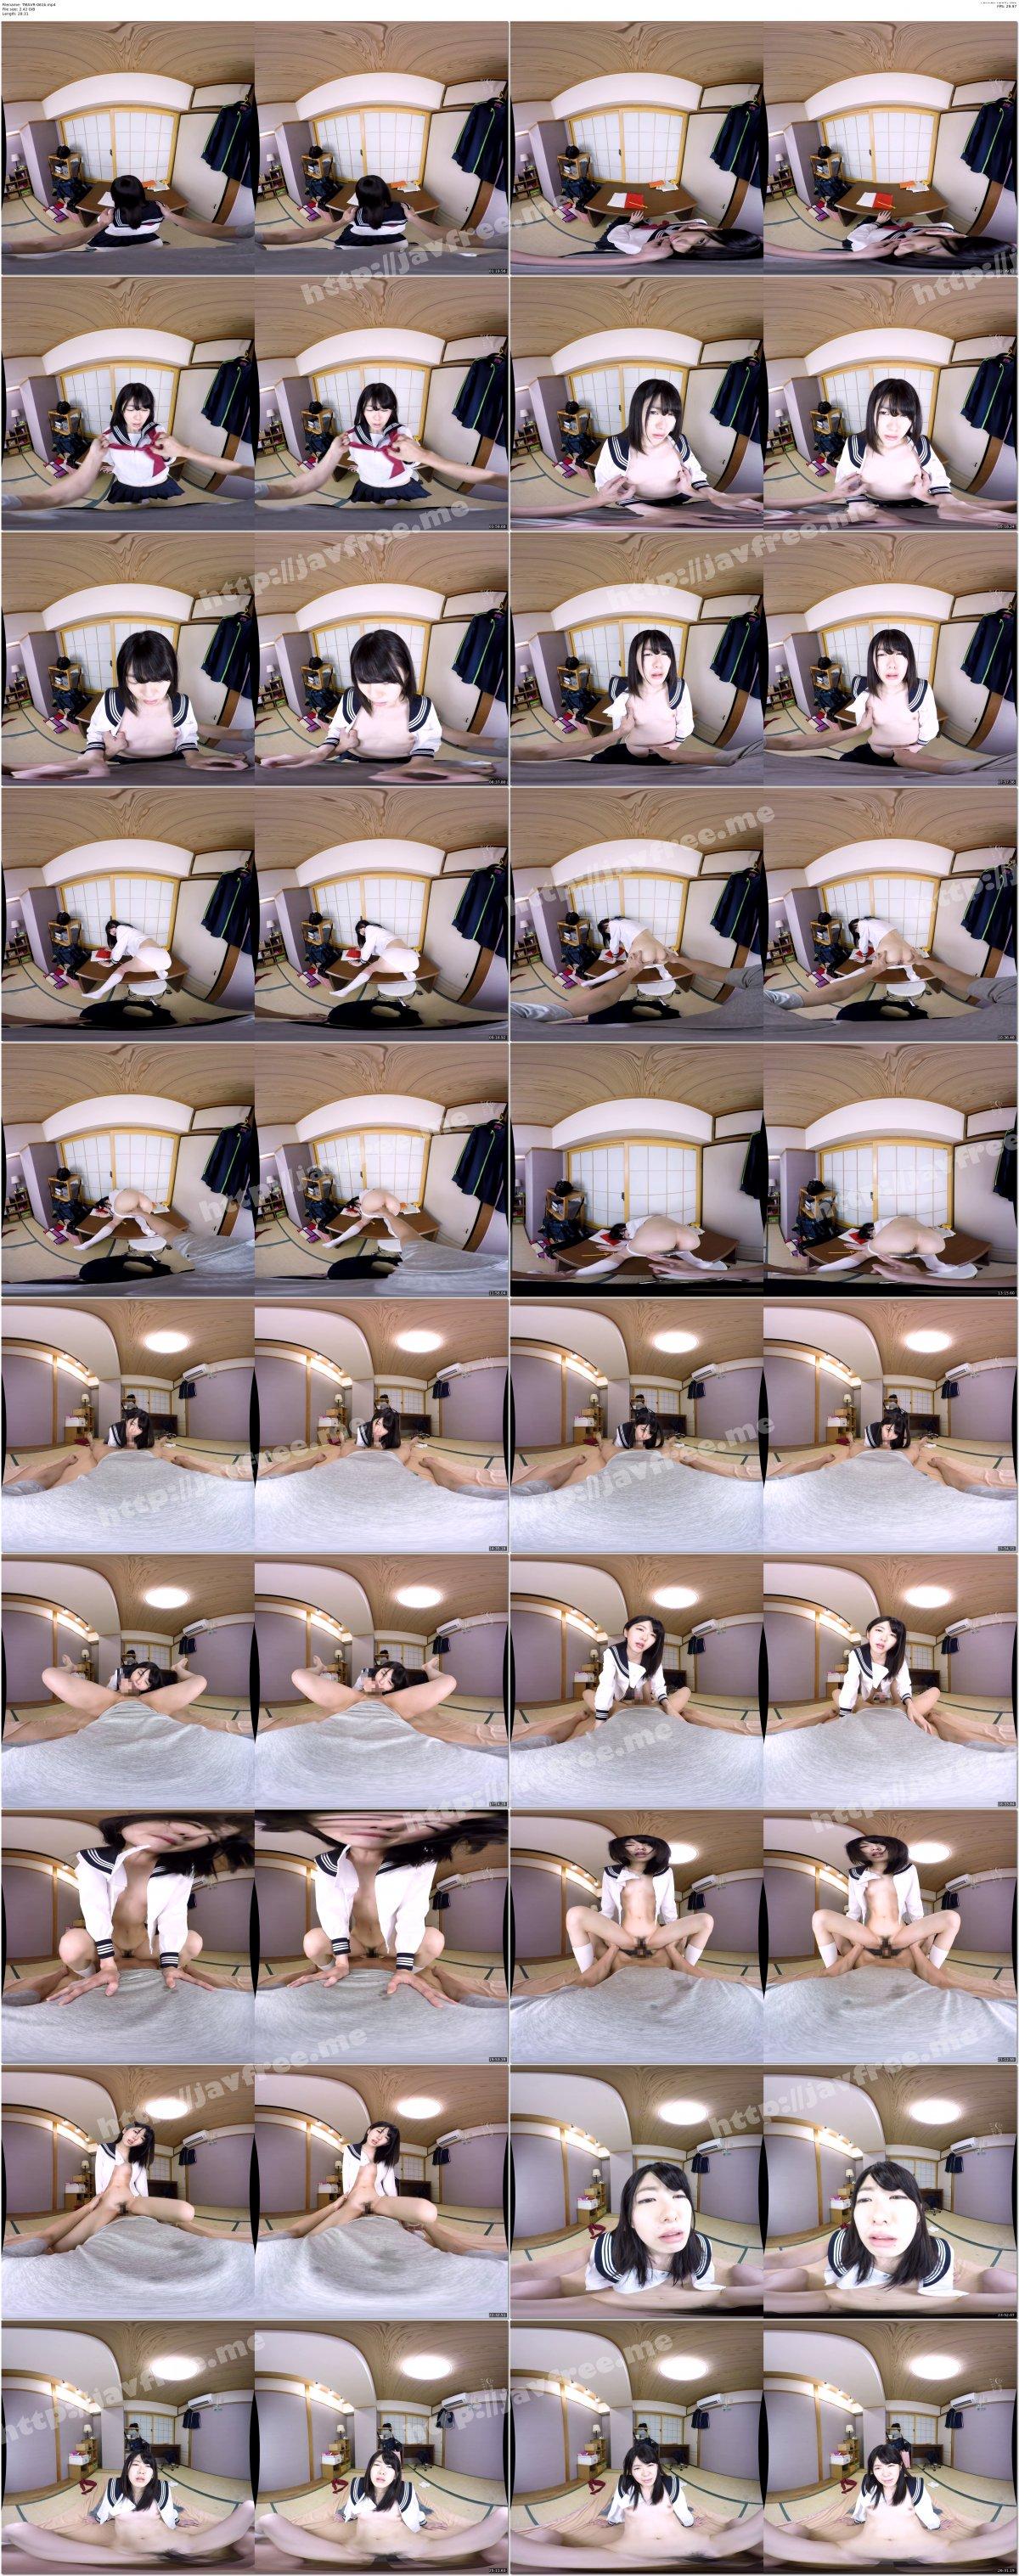 [TMAVR-061] 【VR】父に犯され続ける娘の近親相姦映像VR 有坂深雪 - image TMAVR-061b on https://javfree.me